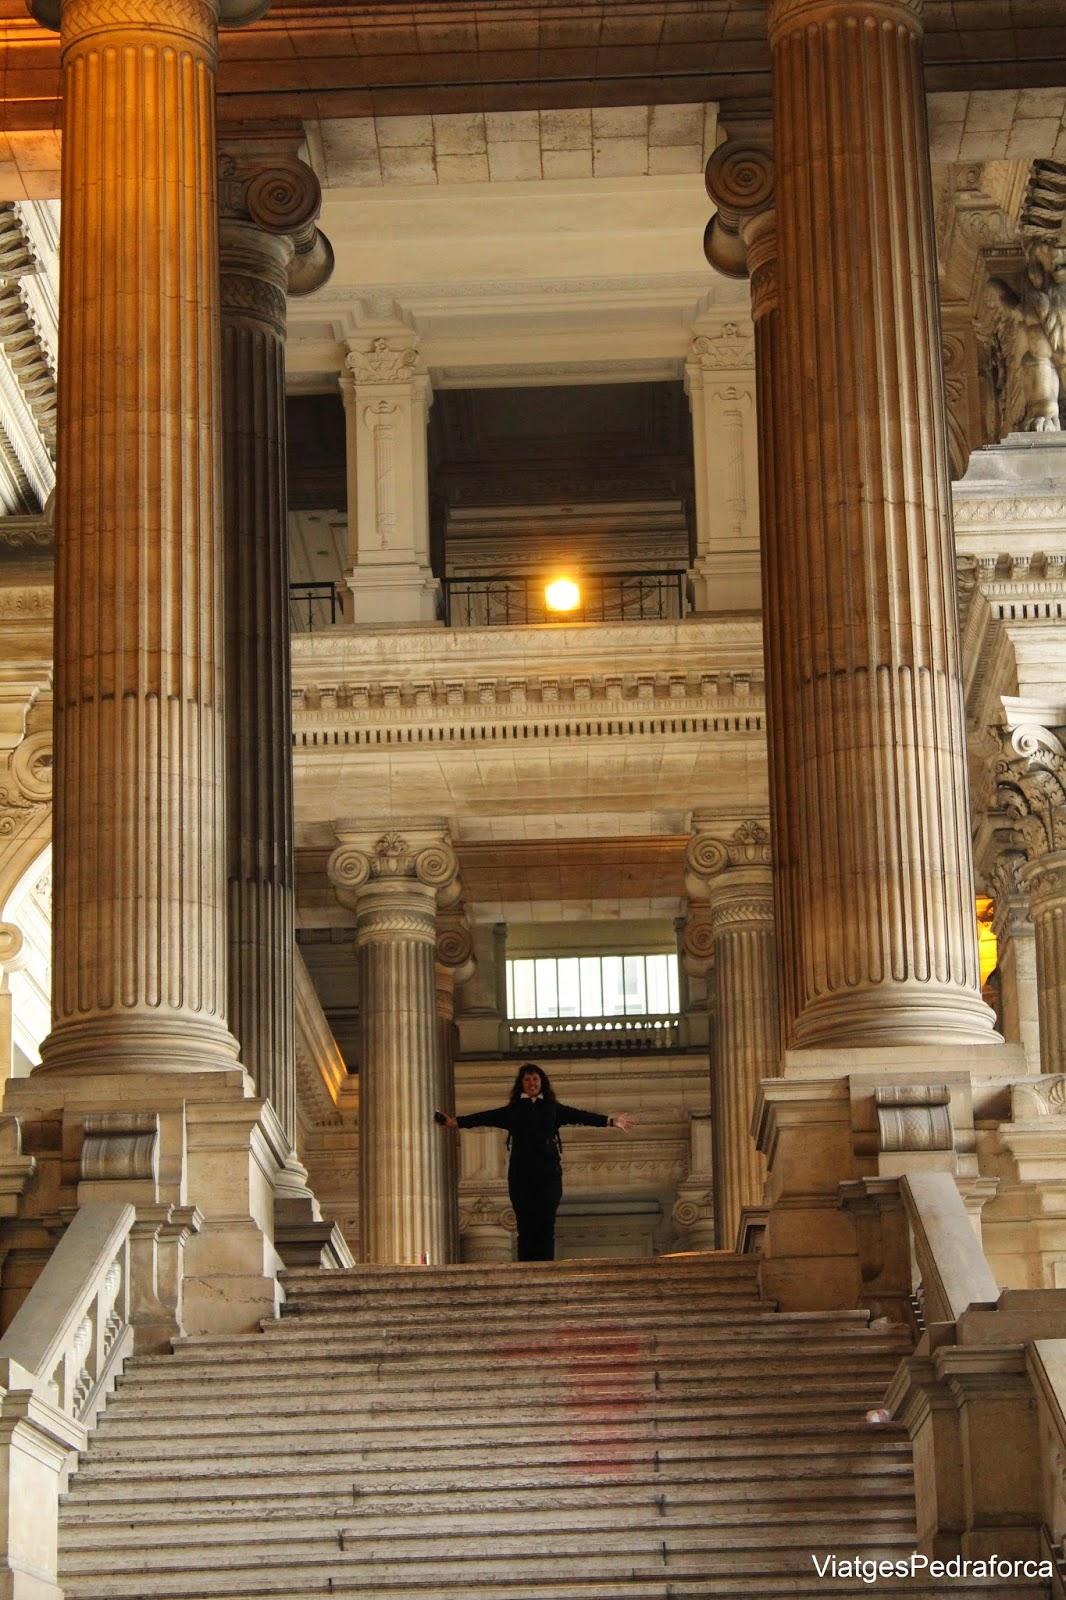 Palau  de Justicia de Brussel.les Belgica